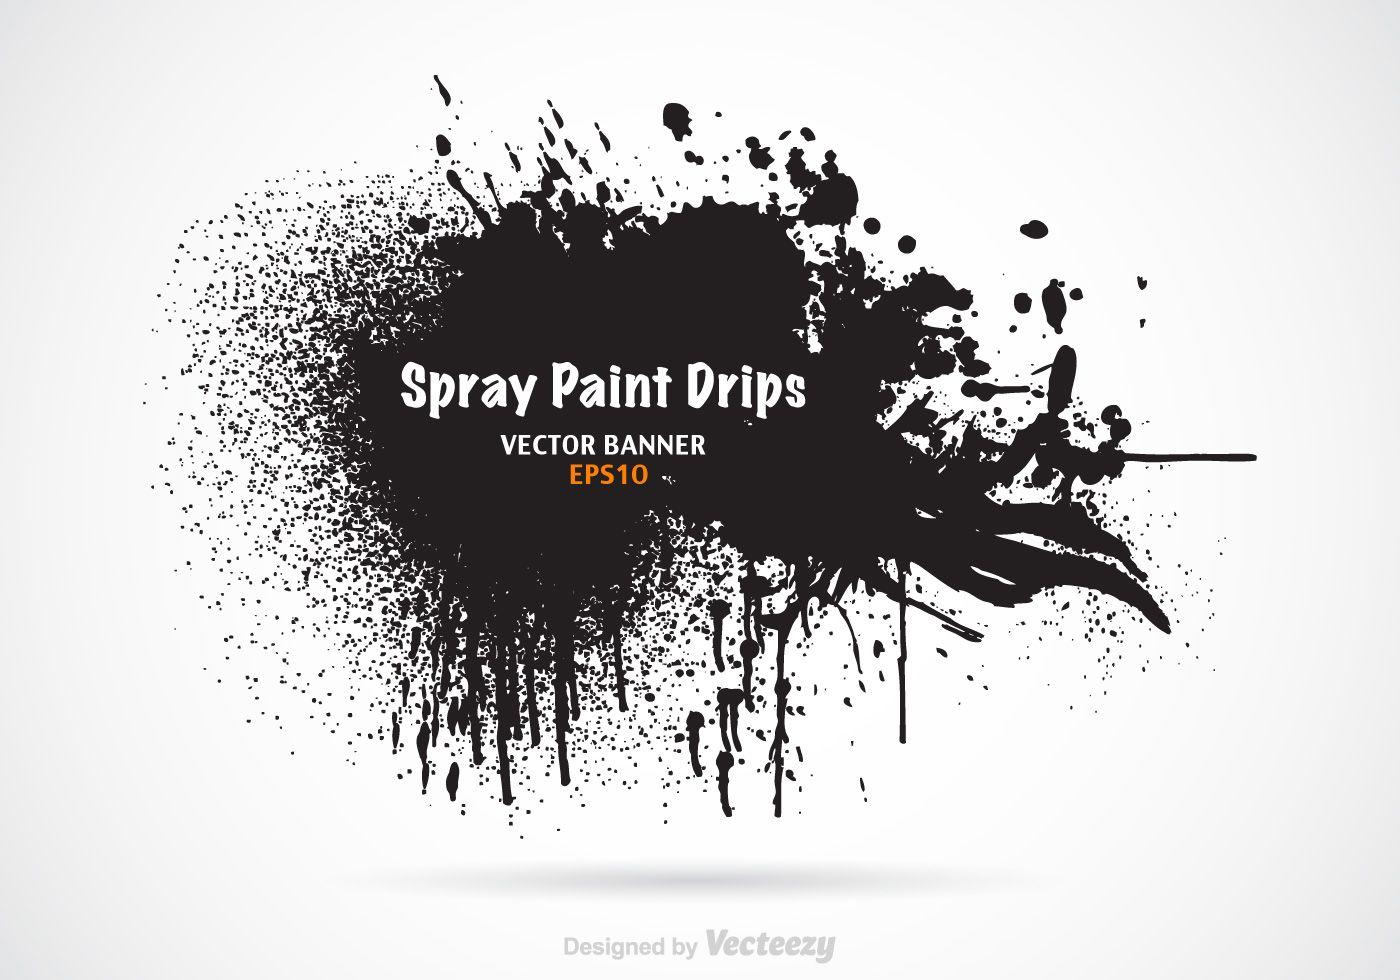 Free Spray Paint Drips Vector Banner Drip Art Drip Painting Vector Art Design